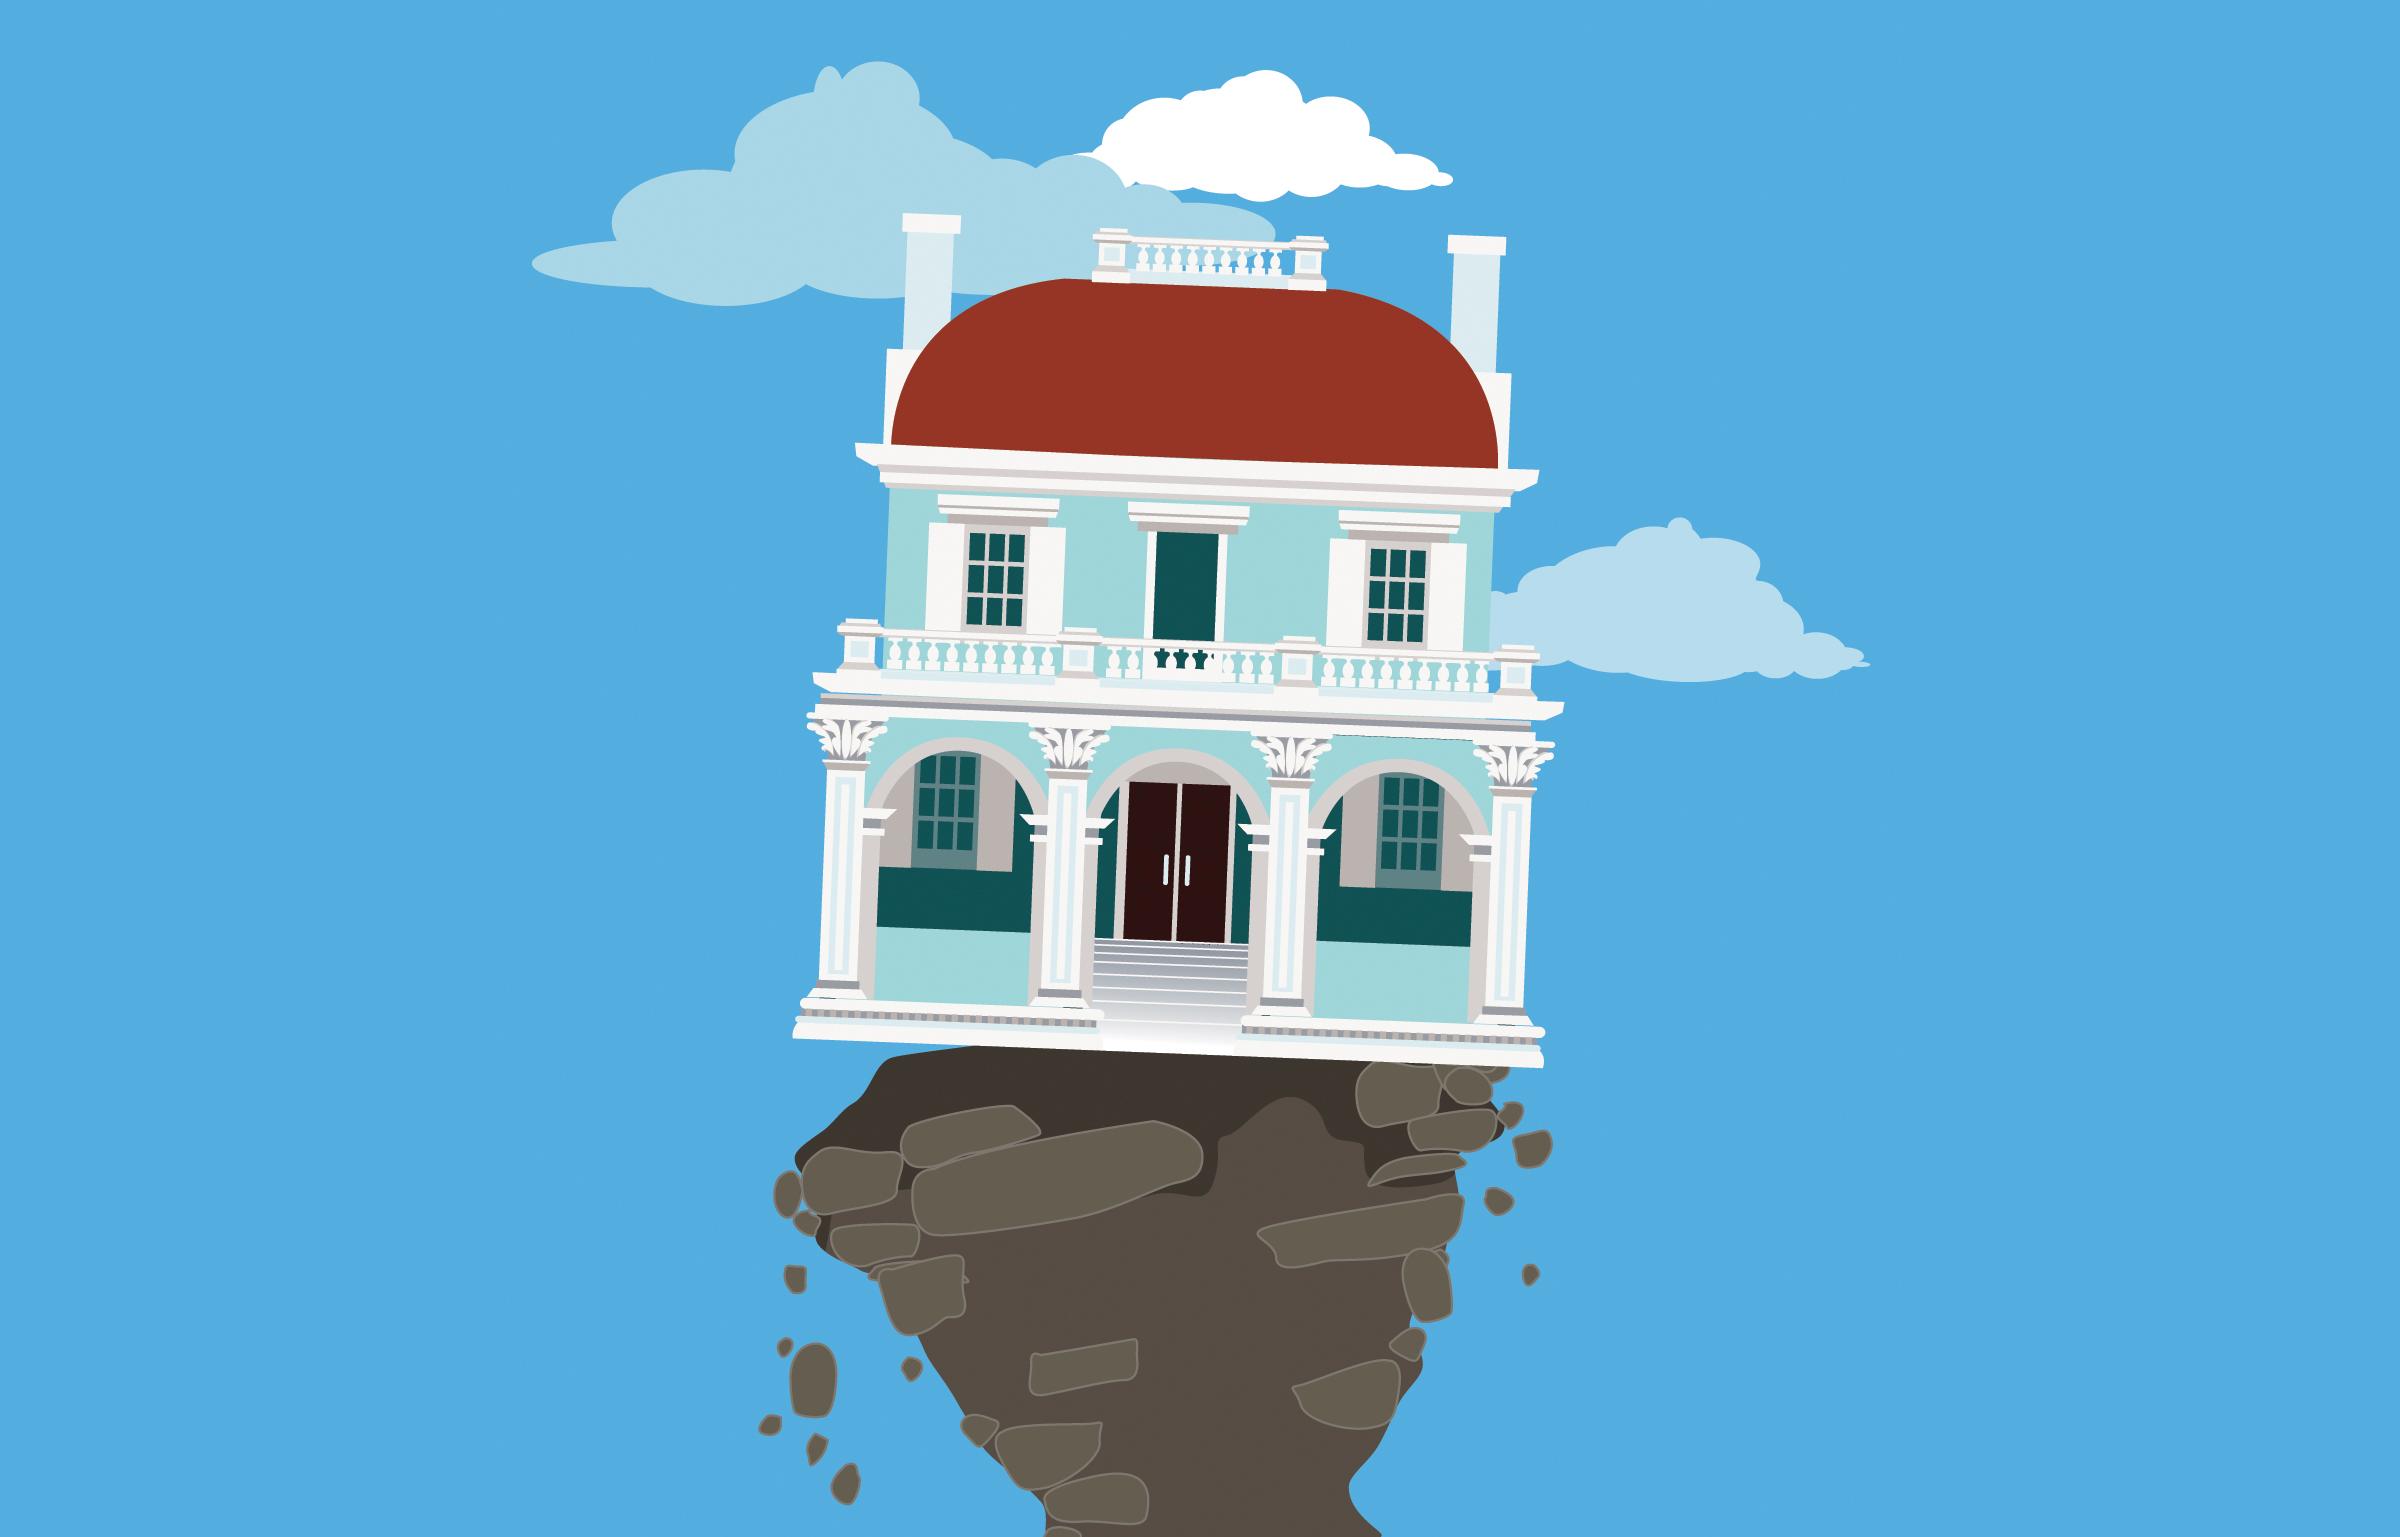 house balancing on crumbling ground